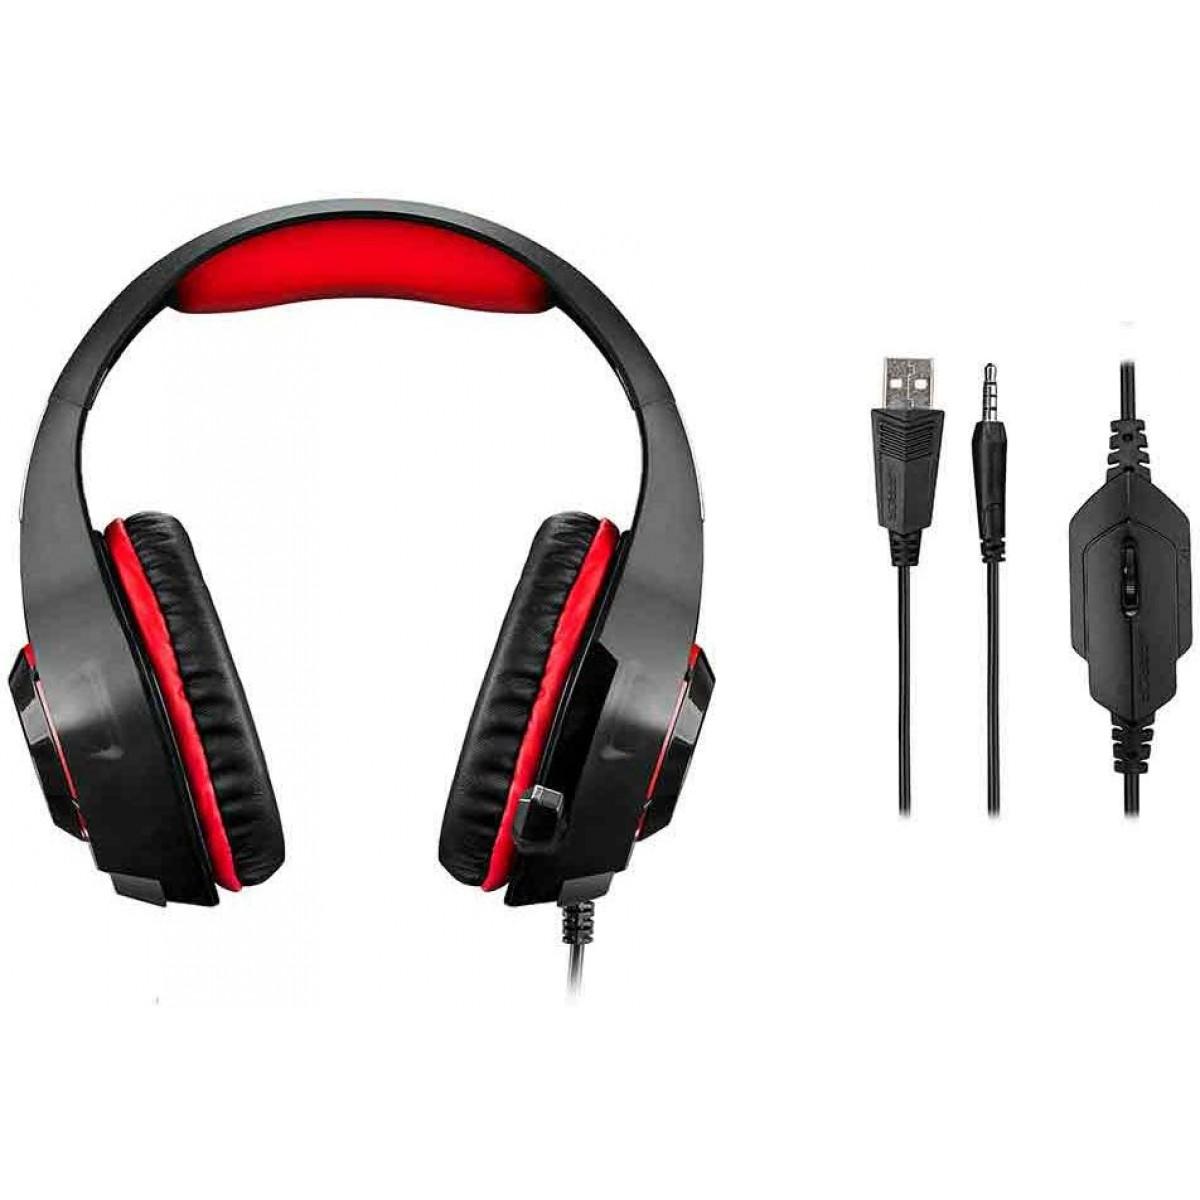 Headset Gamer Warrior Rama Stero, Preto/Vermelho, PH219